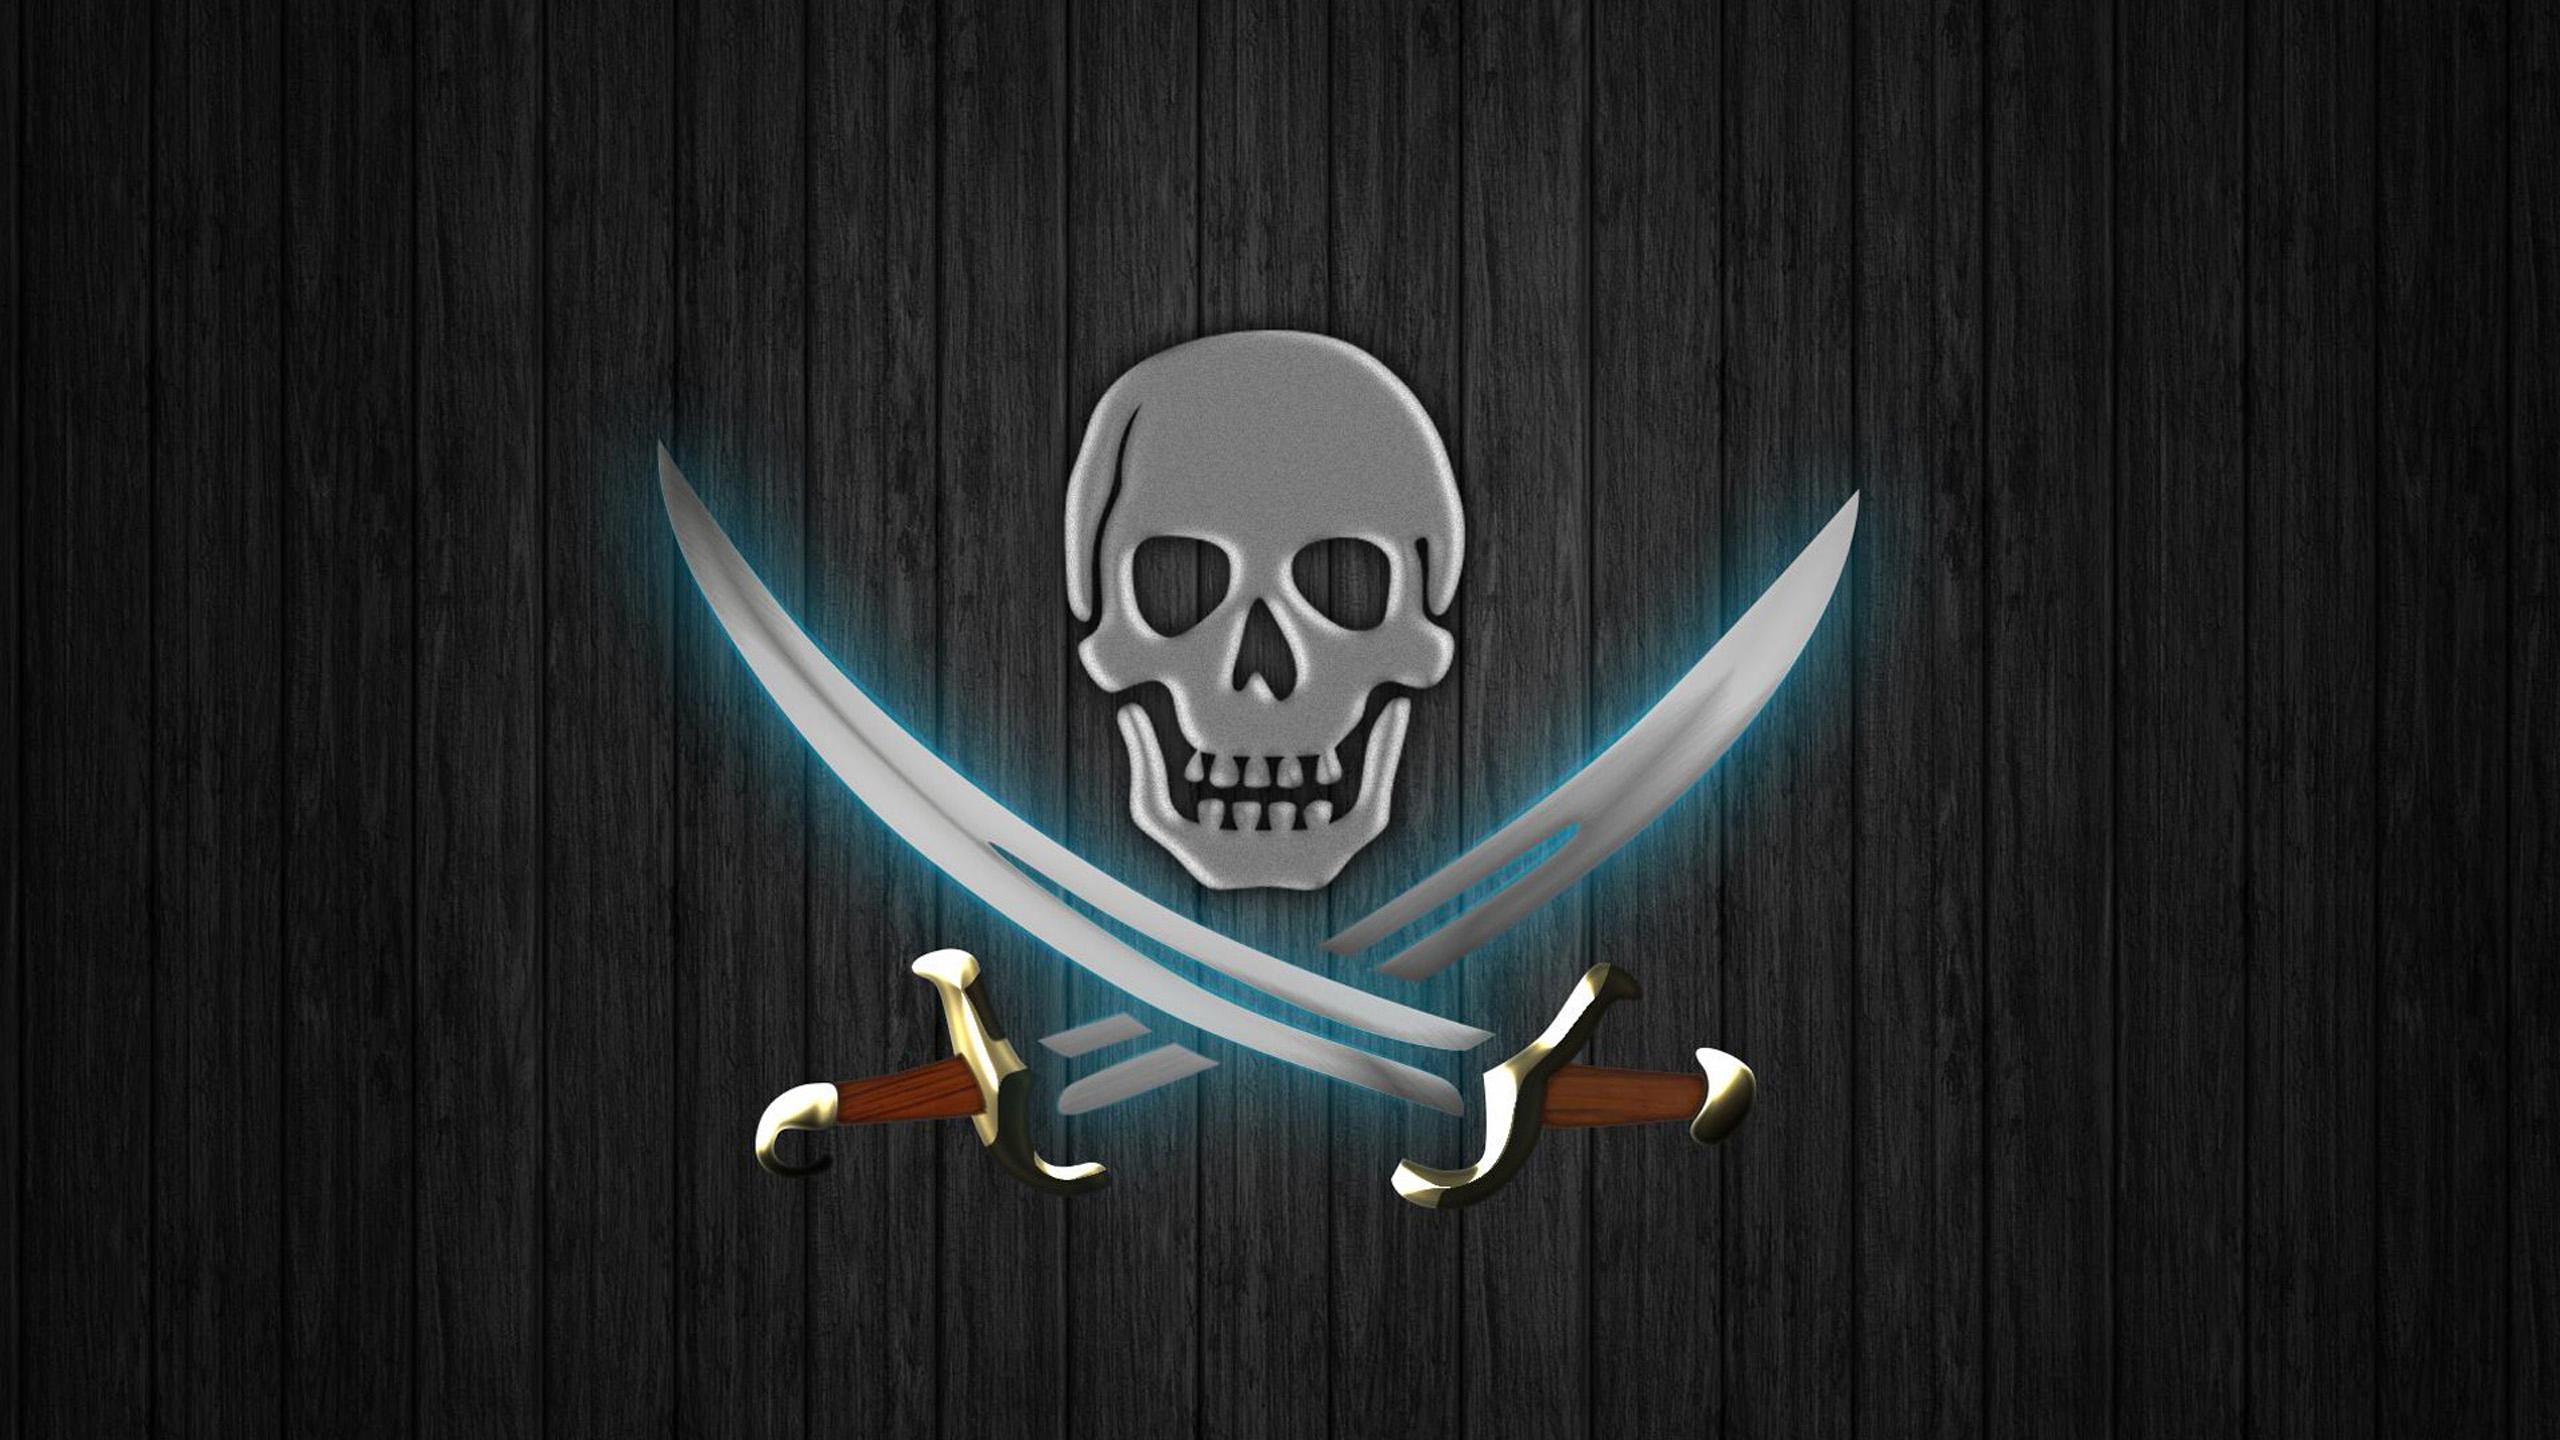 Pirate Skull Wallpaper 2560x1440 1167863 Wallpaperup